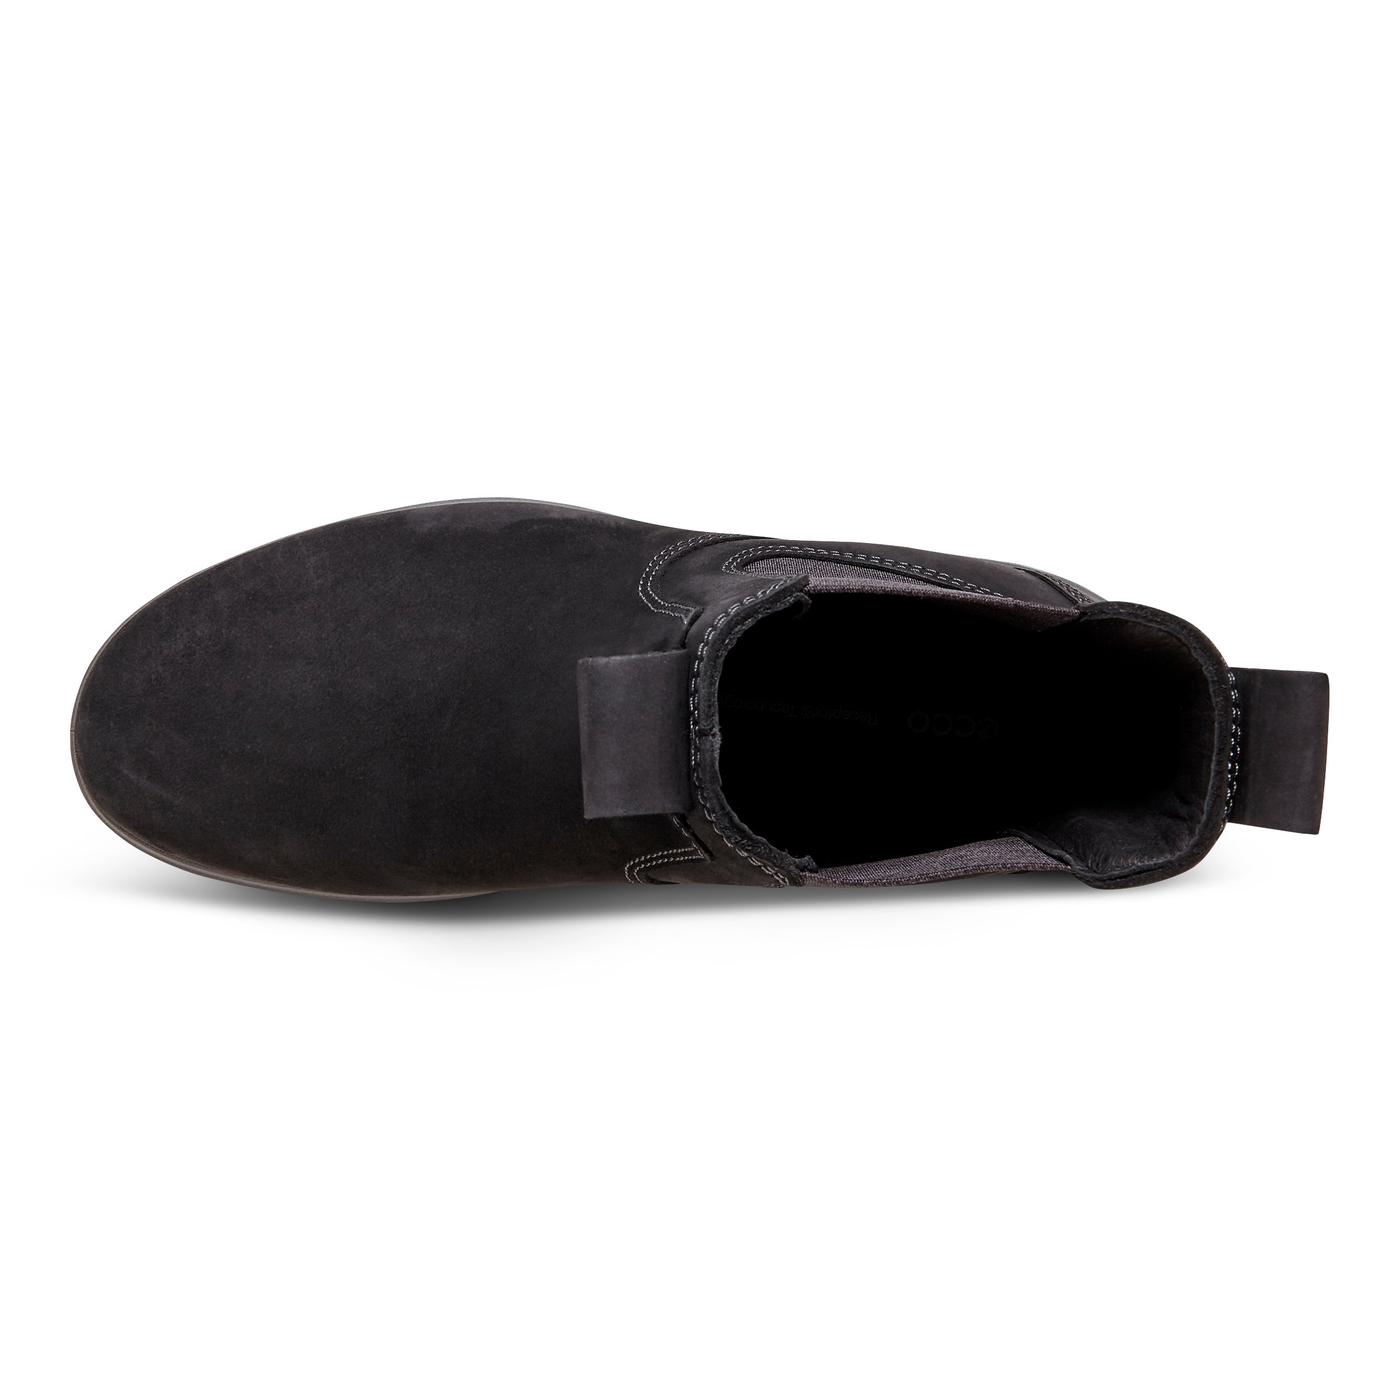 ECCO WHISTLER Chelsea Boot